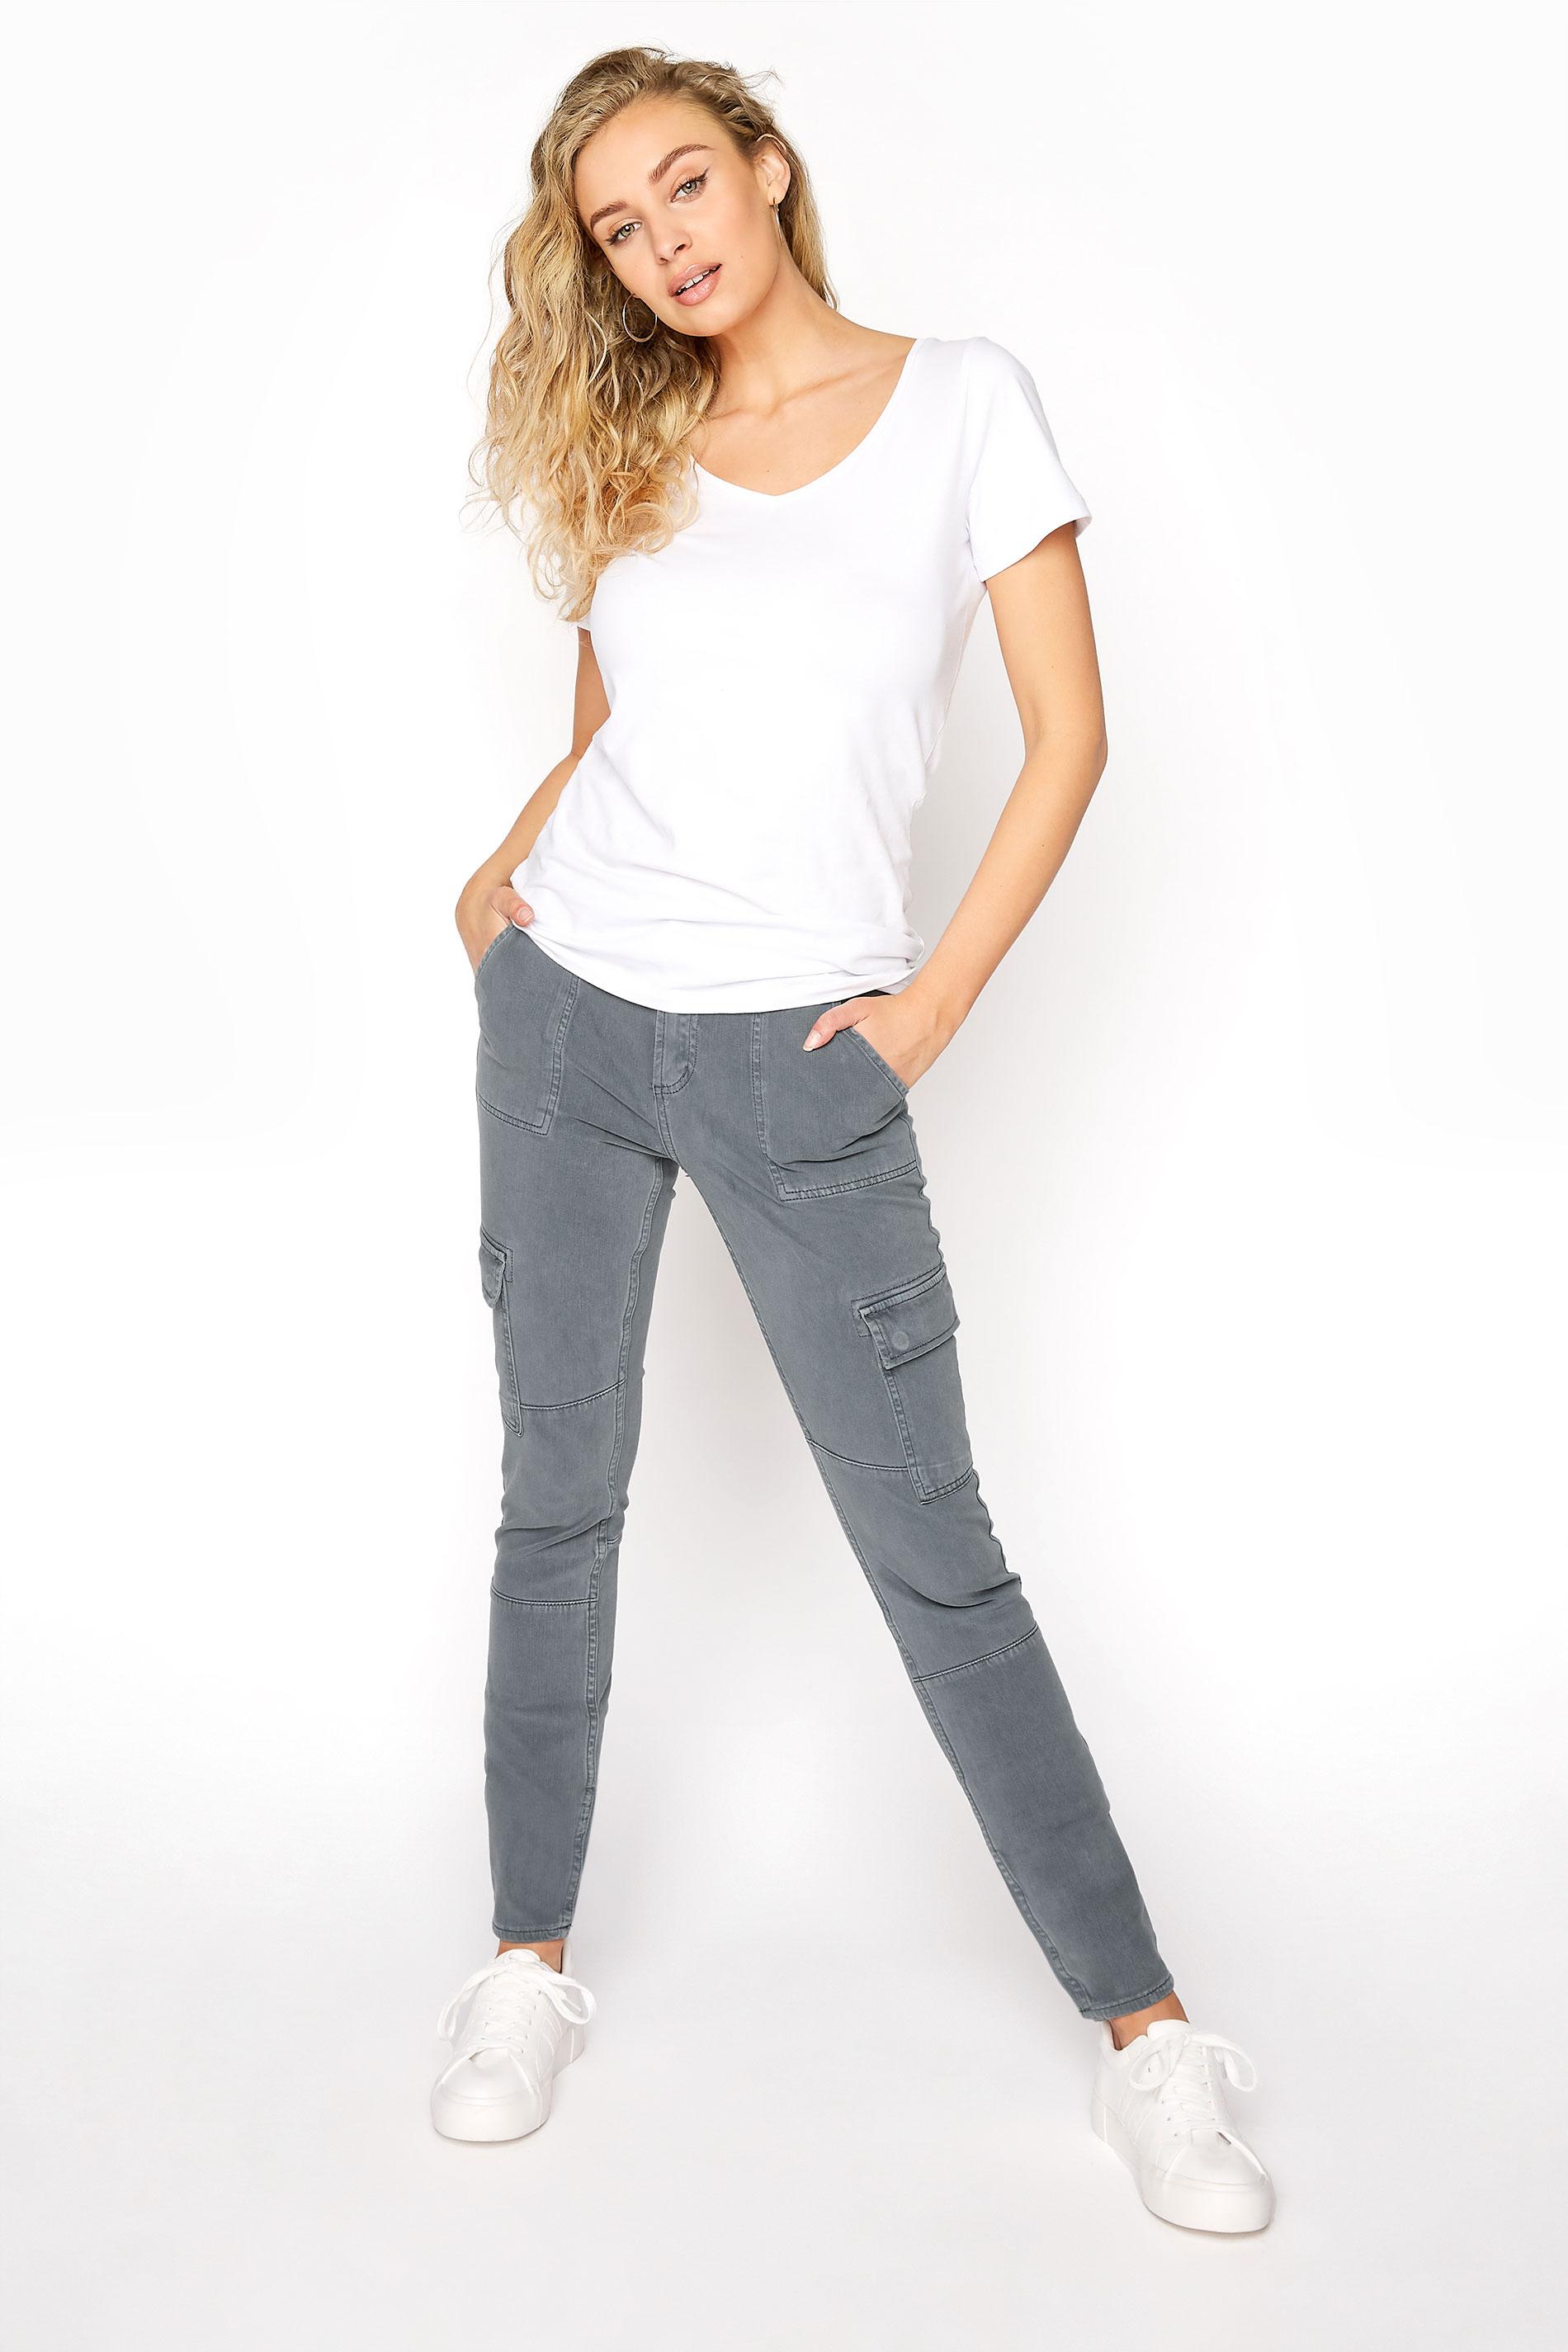 SILVER JEANS Slate Grey Low Rise Skinny Cargo Jeans